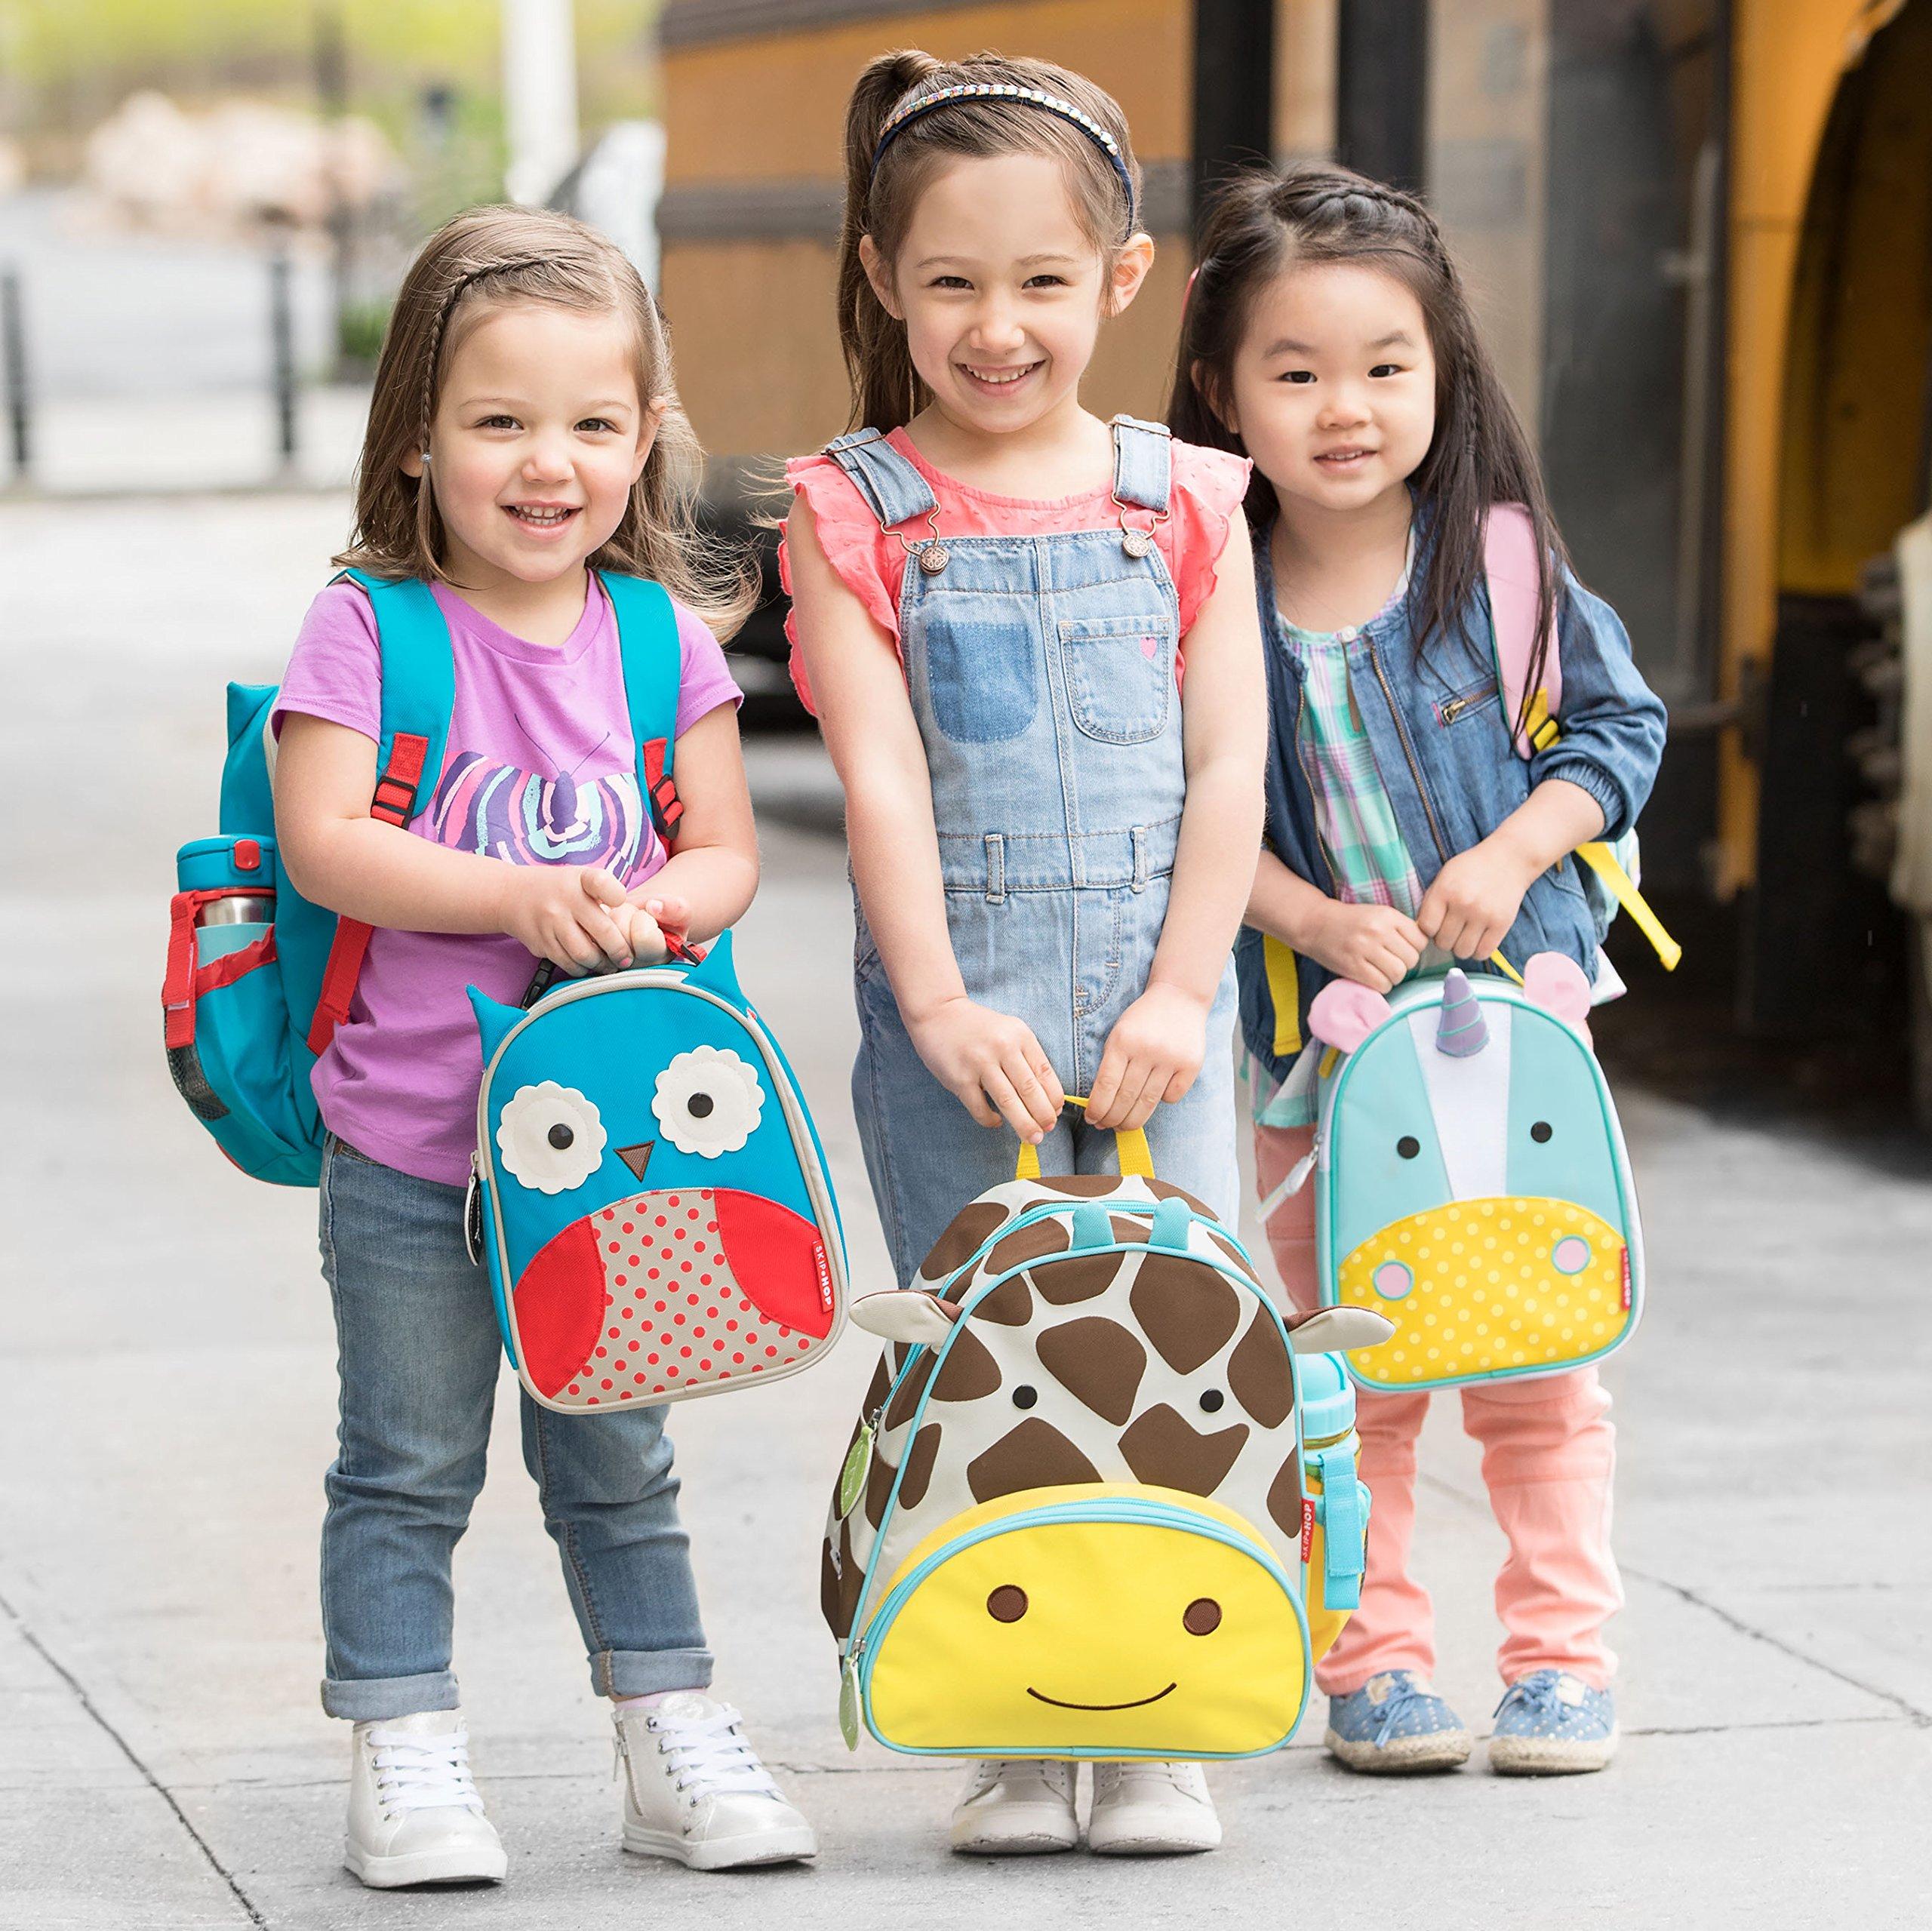 Skip Hop Zoo Kids Insulated Lunch Box, Otis Owl, 9''x3.25''x7.5'', Blue